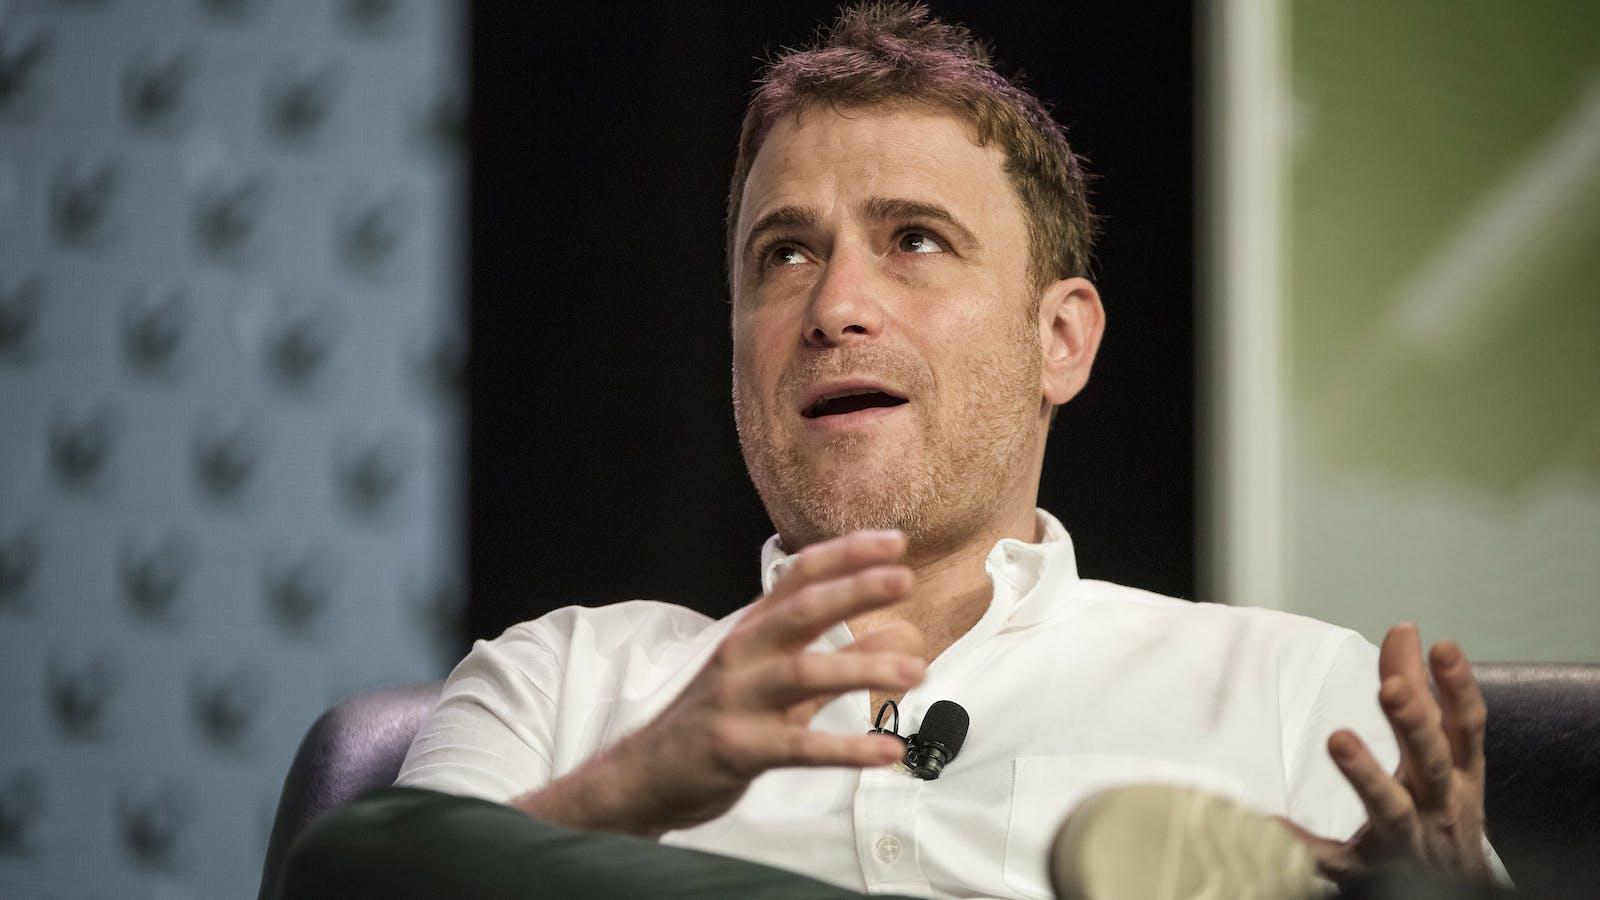 Slack CEO Stewart Butterfield. Photo by Bloomberg.